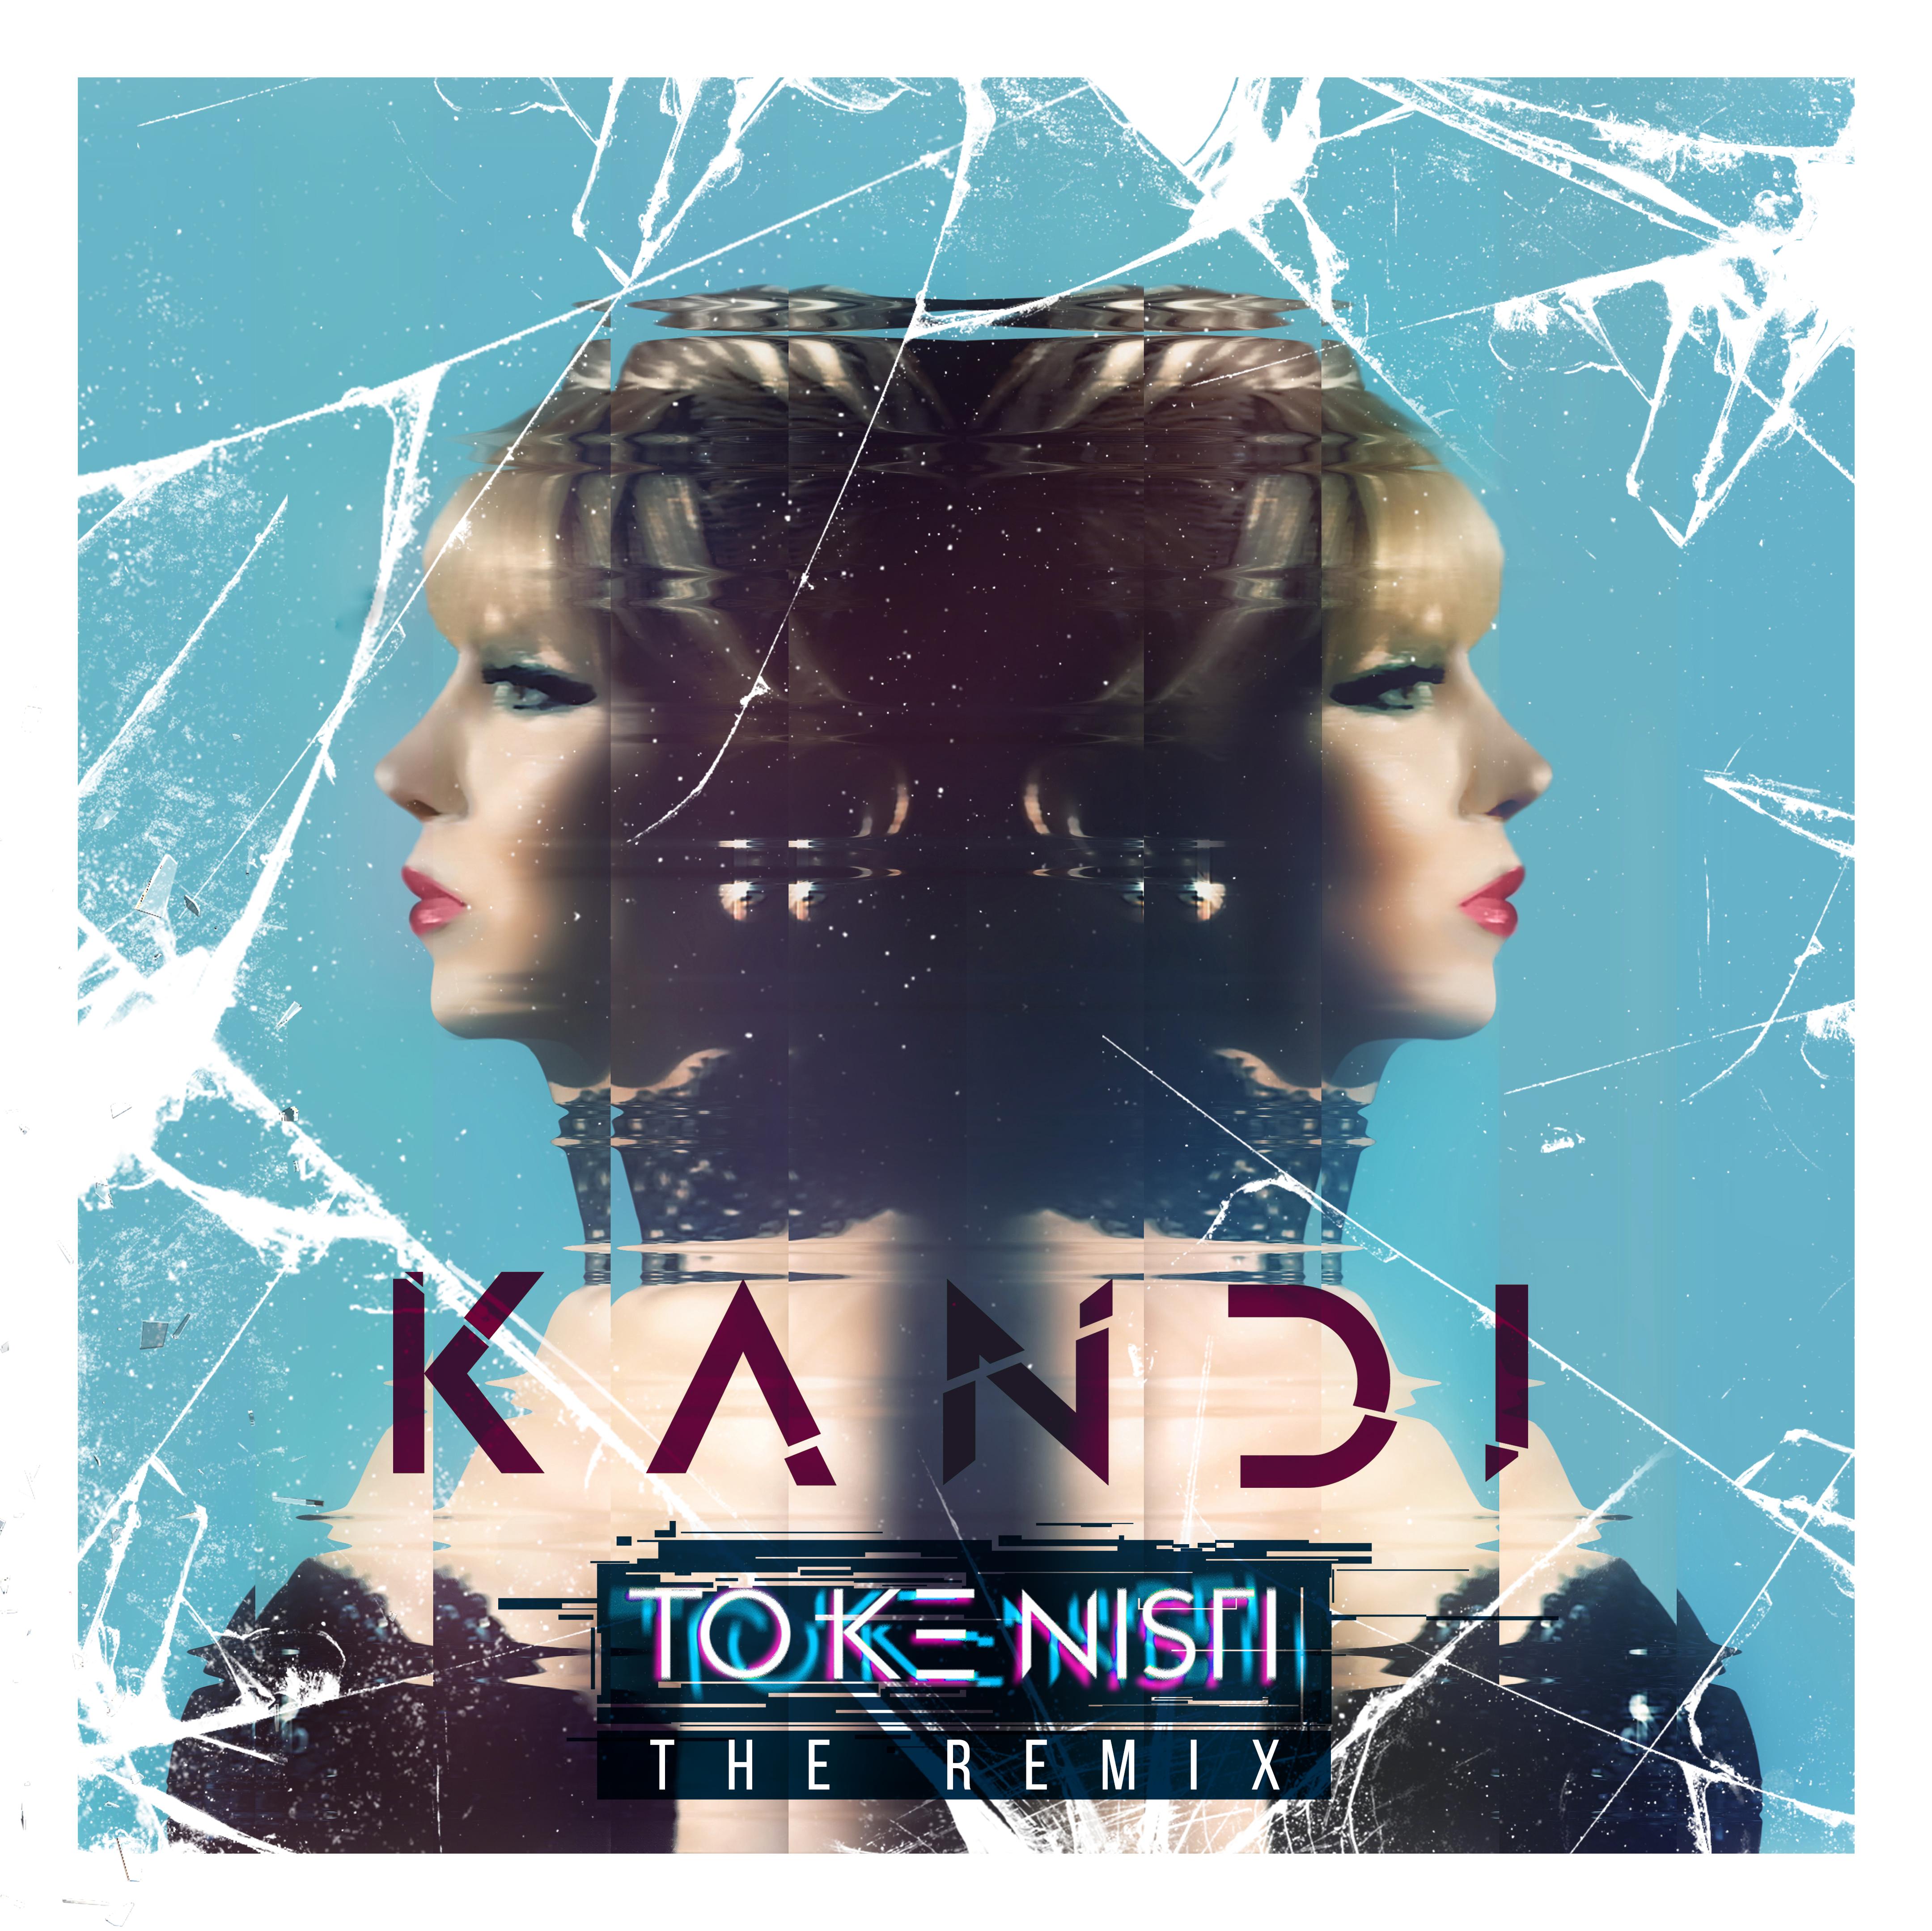 Kandi - To ke nisti Remix version Official Cover Music